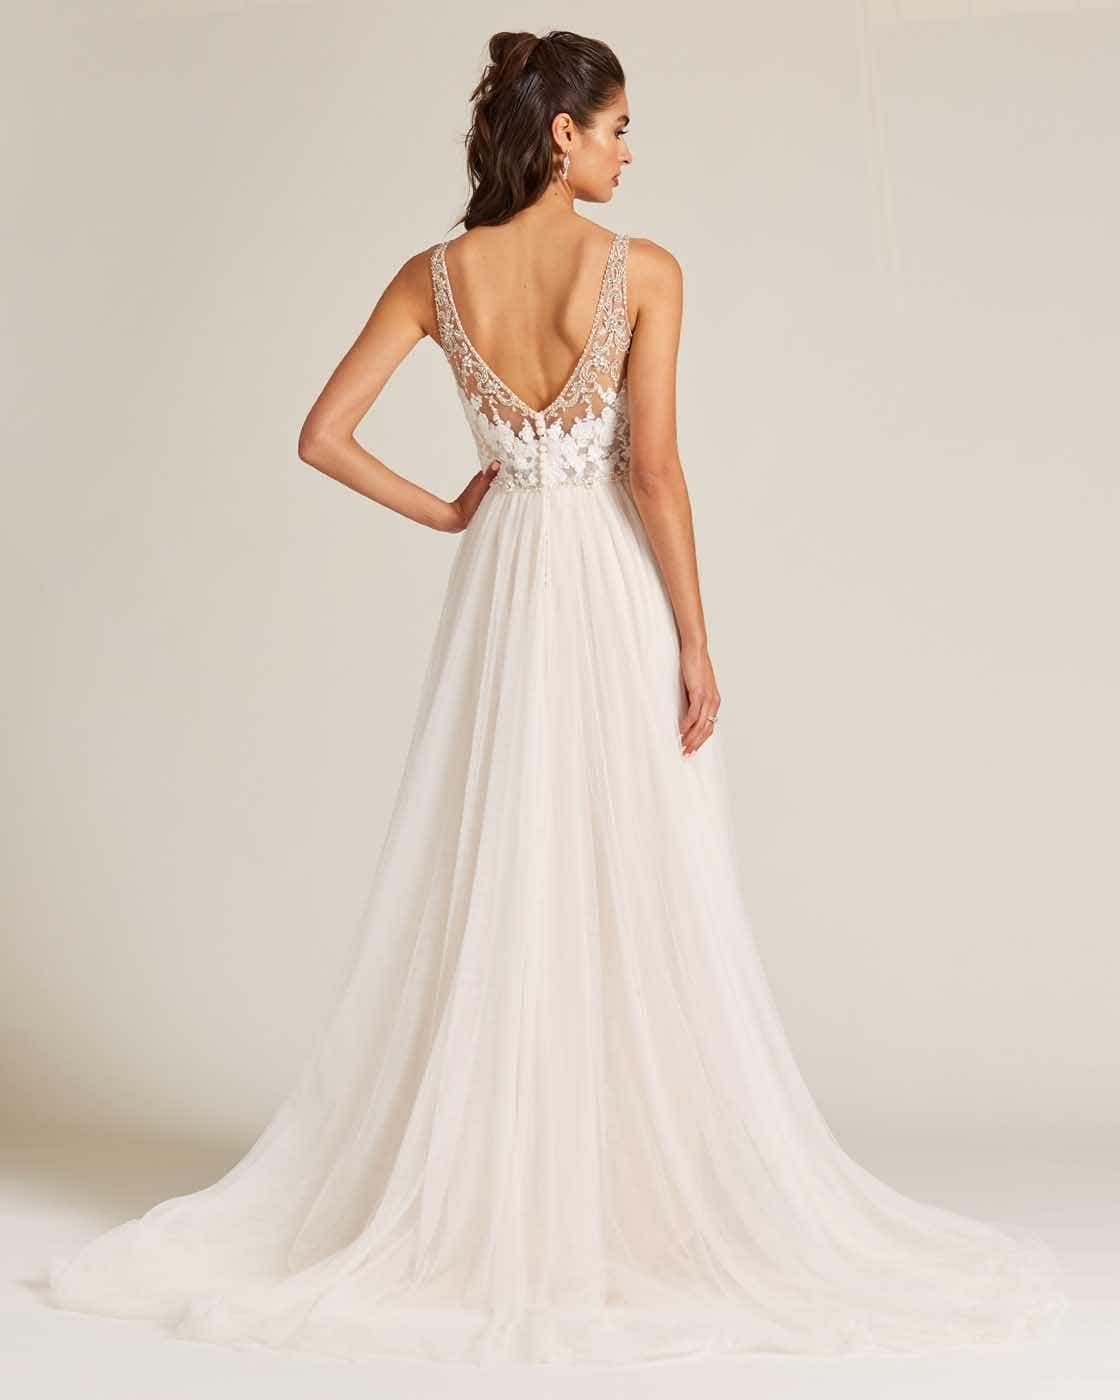 Blush Embroidered Top Wedding Dress - Back